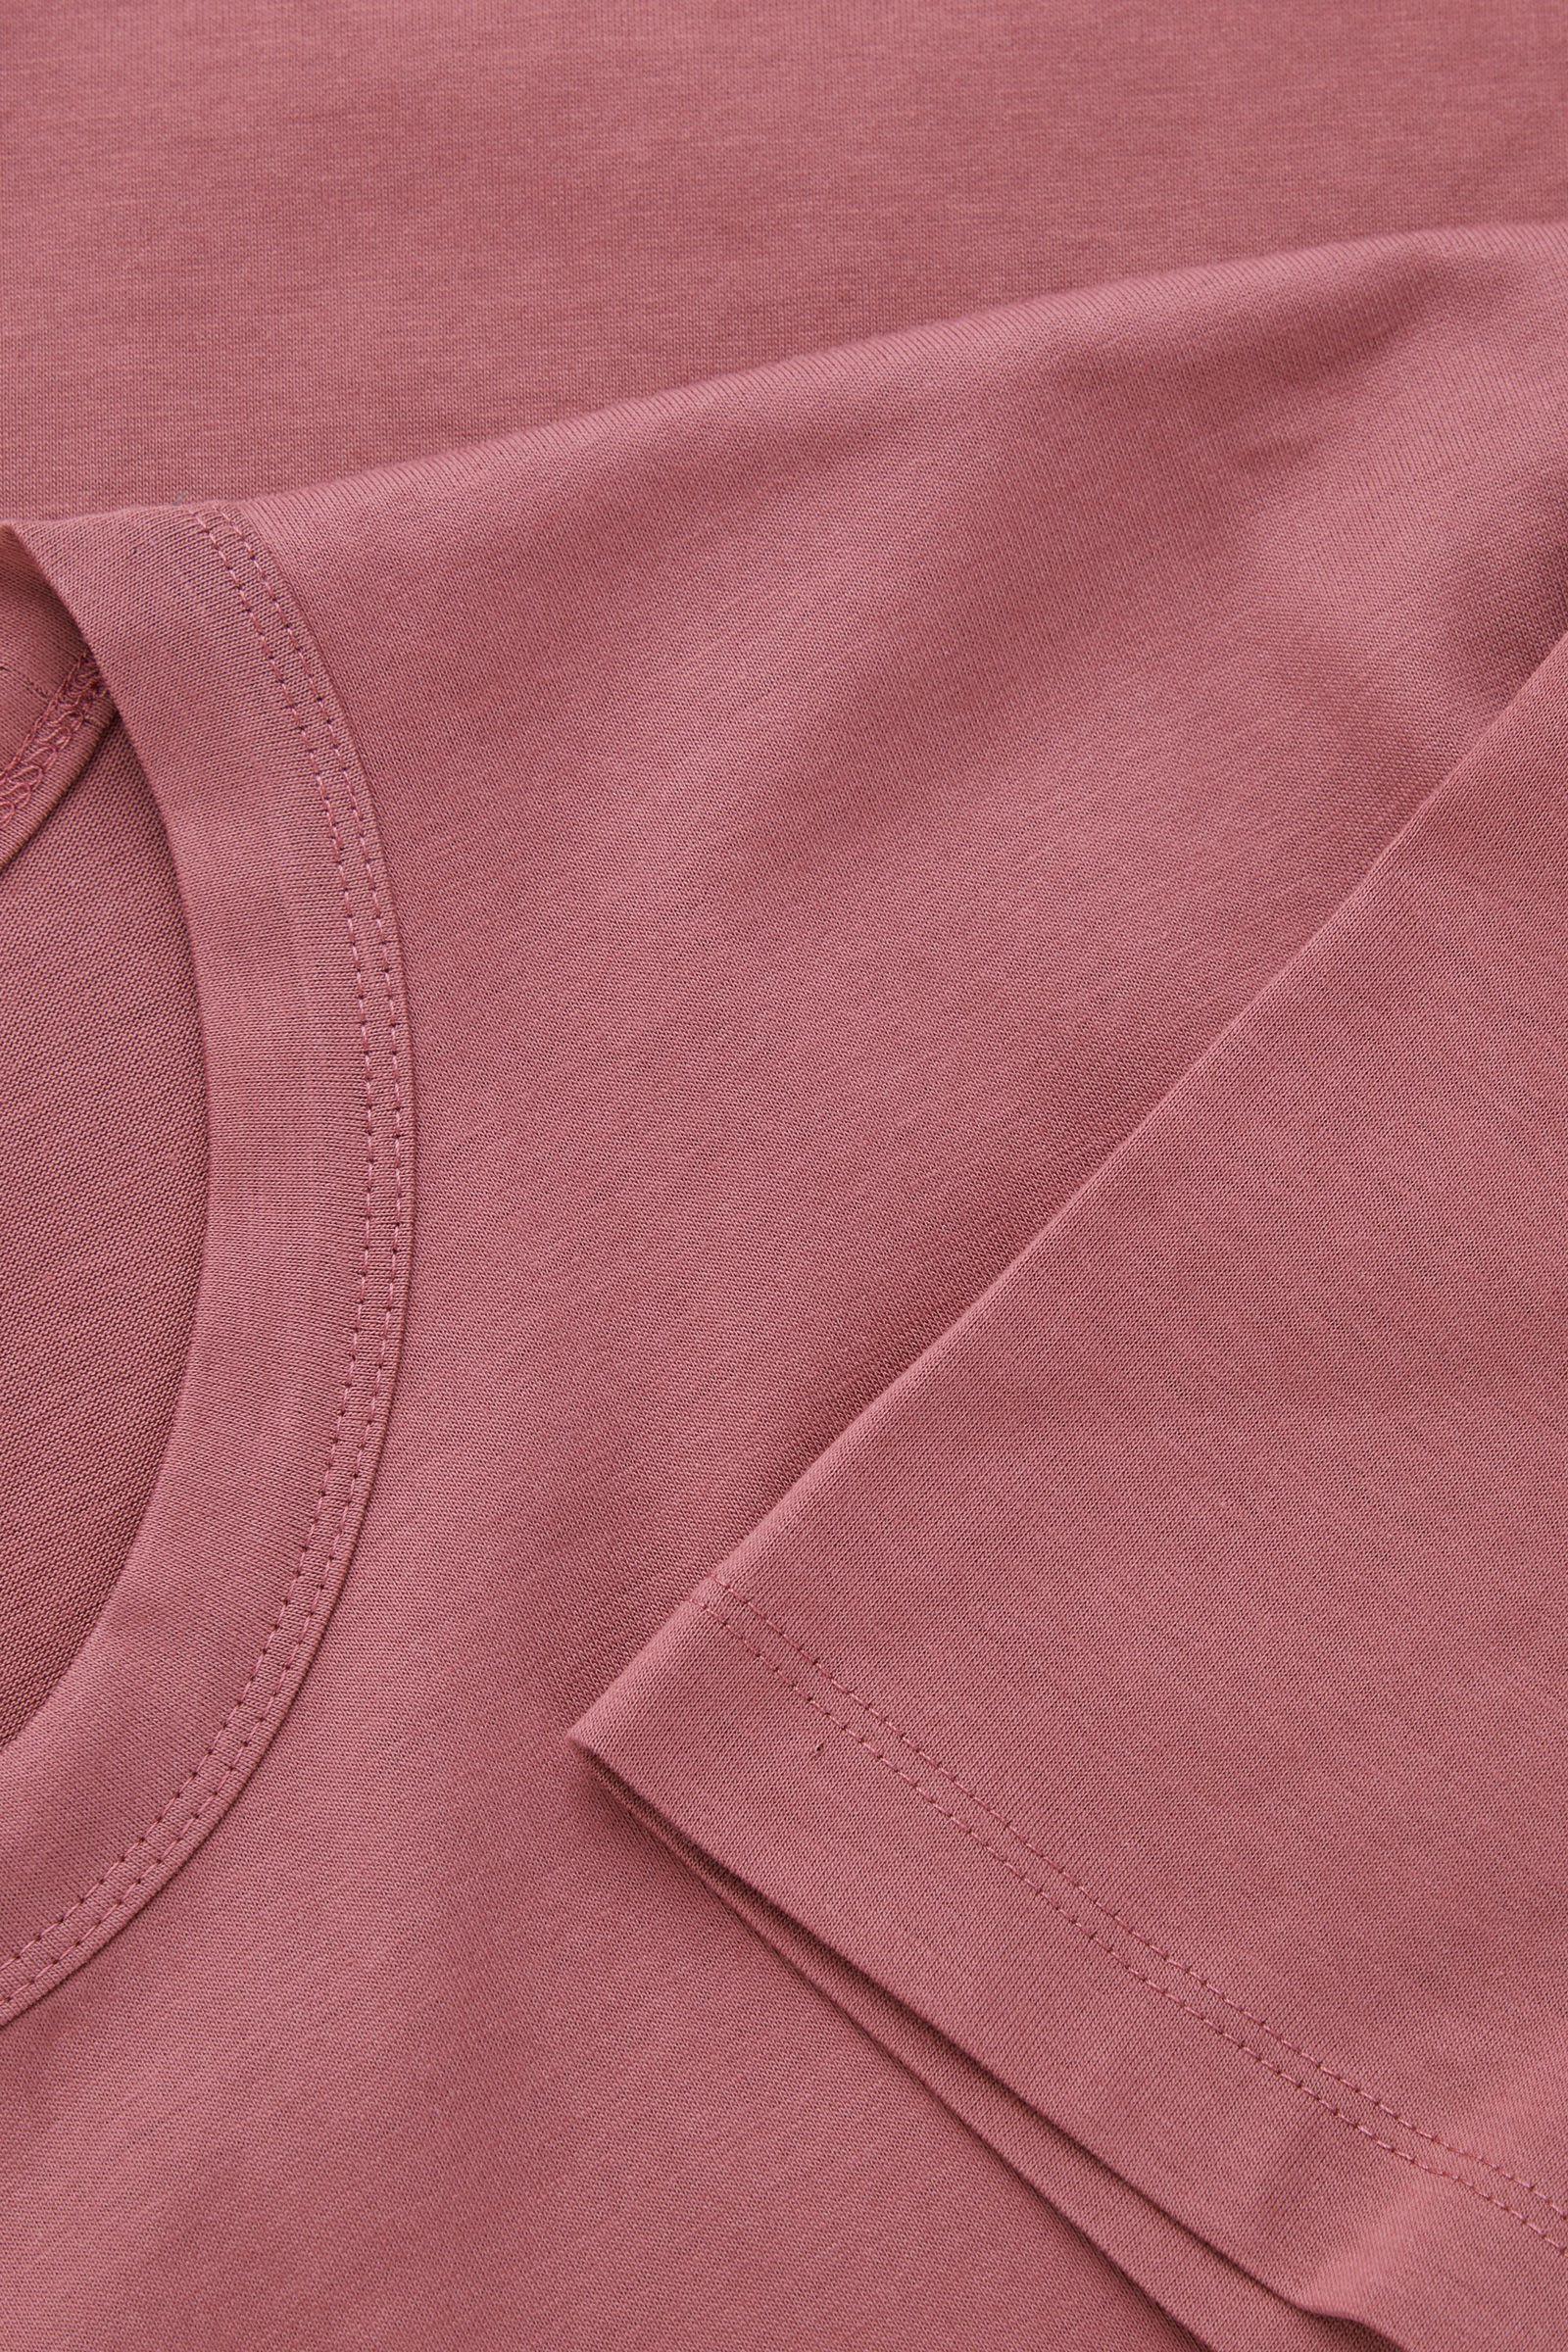 COS 오가닉 코튼 슬림핏 티셔츠의 더스티 핑크컬러 Detail입니다.